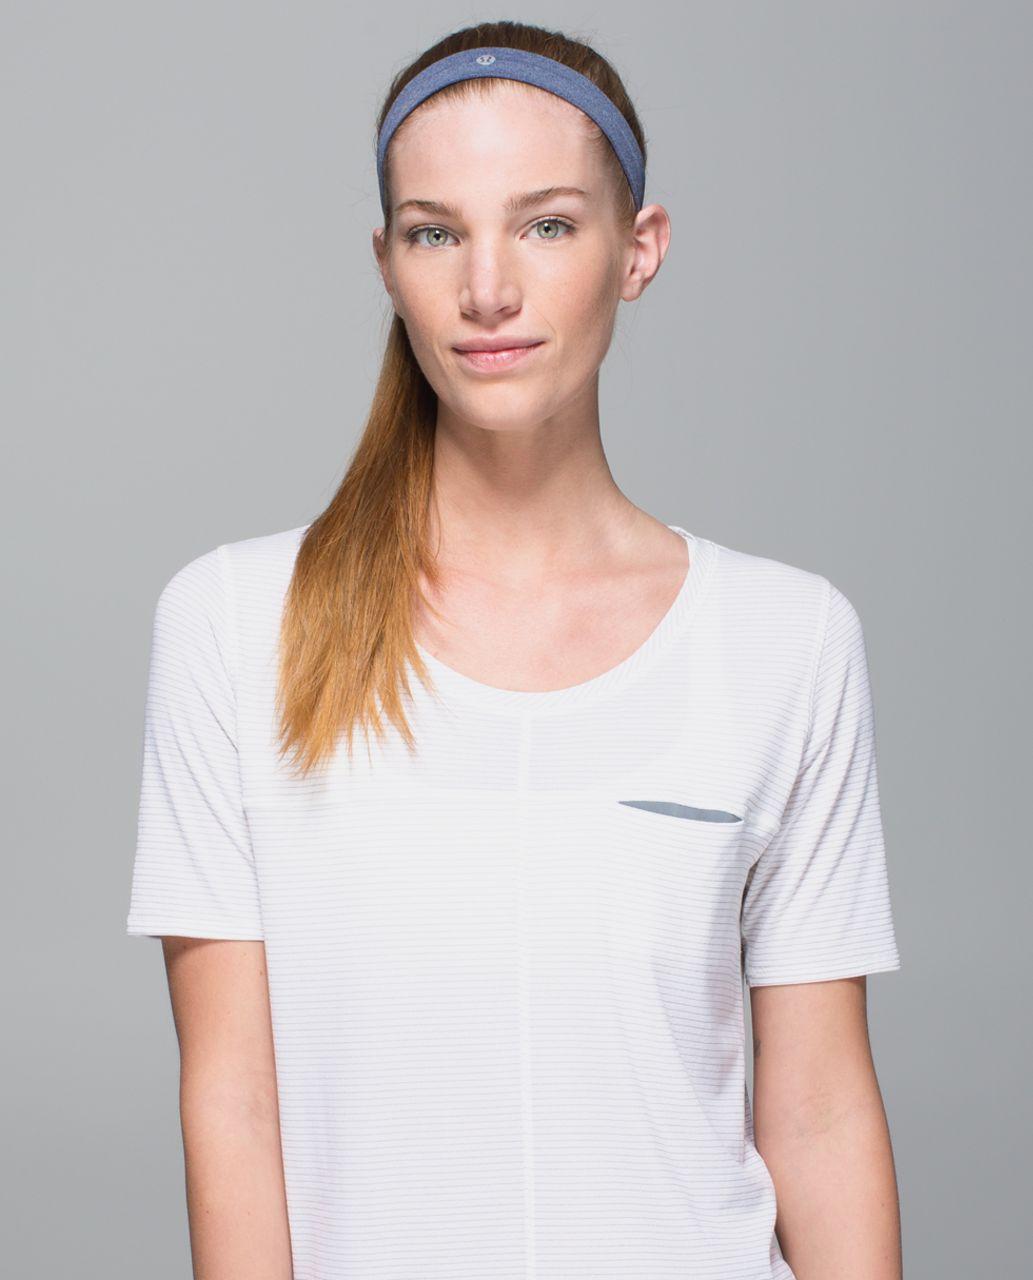 Lululemon Cardio Cross Trainer Headband - Heathered Deep Navy